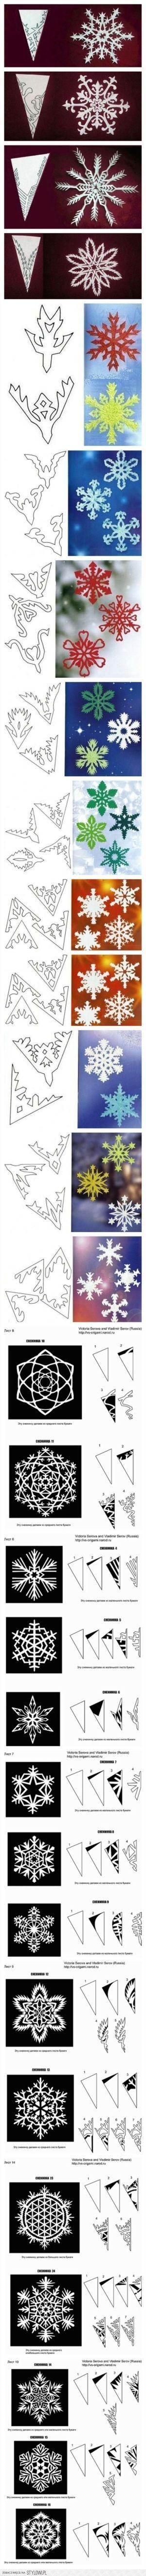 snowflakes by mariann.bjornfot